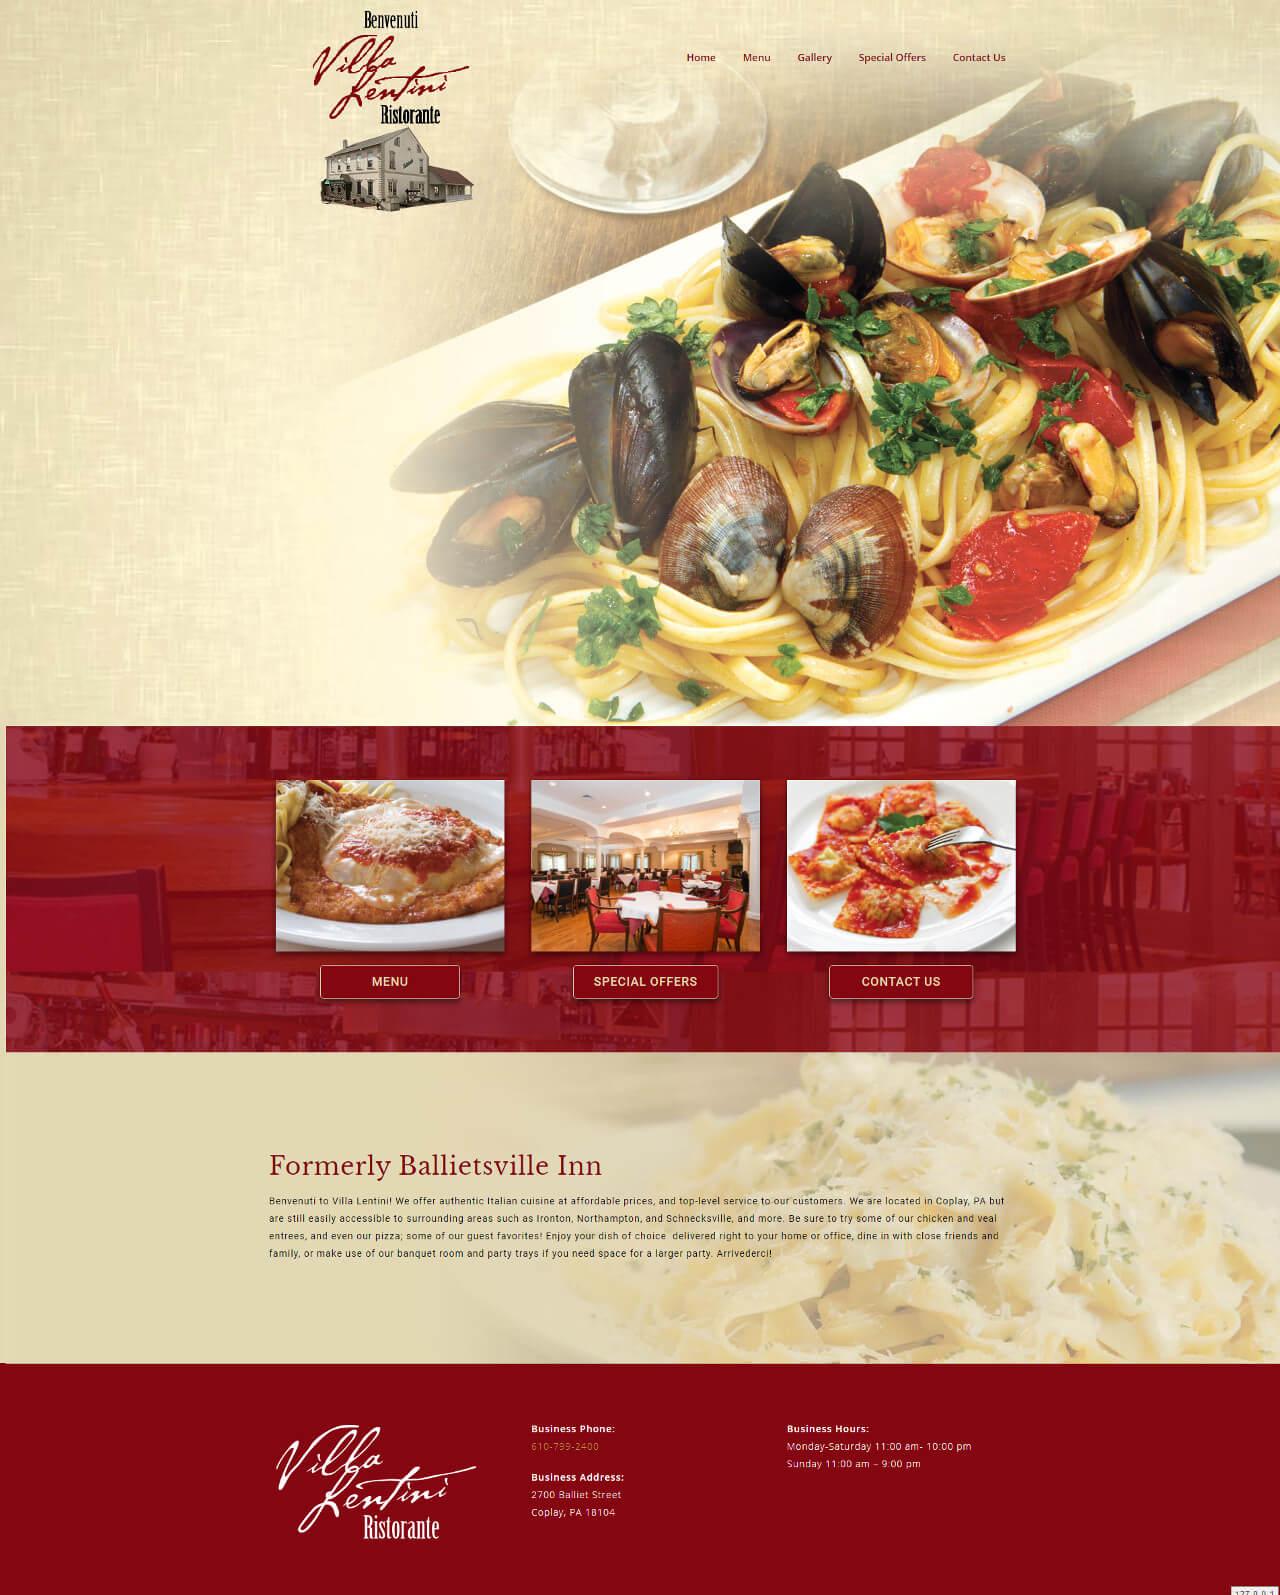 Villa Lentini Restaurant - TLS Mobile Friendly Website